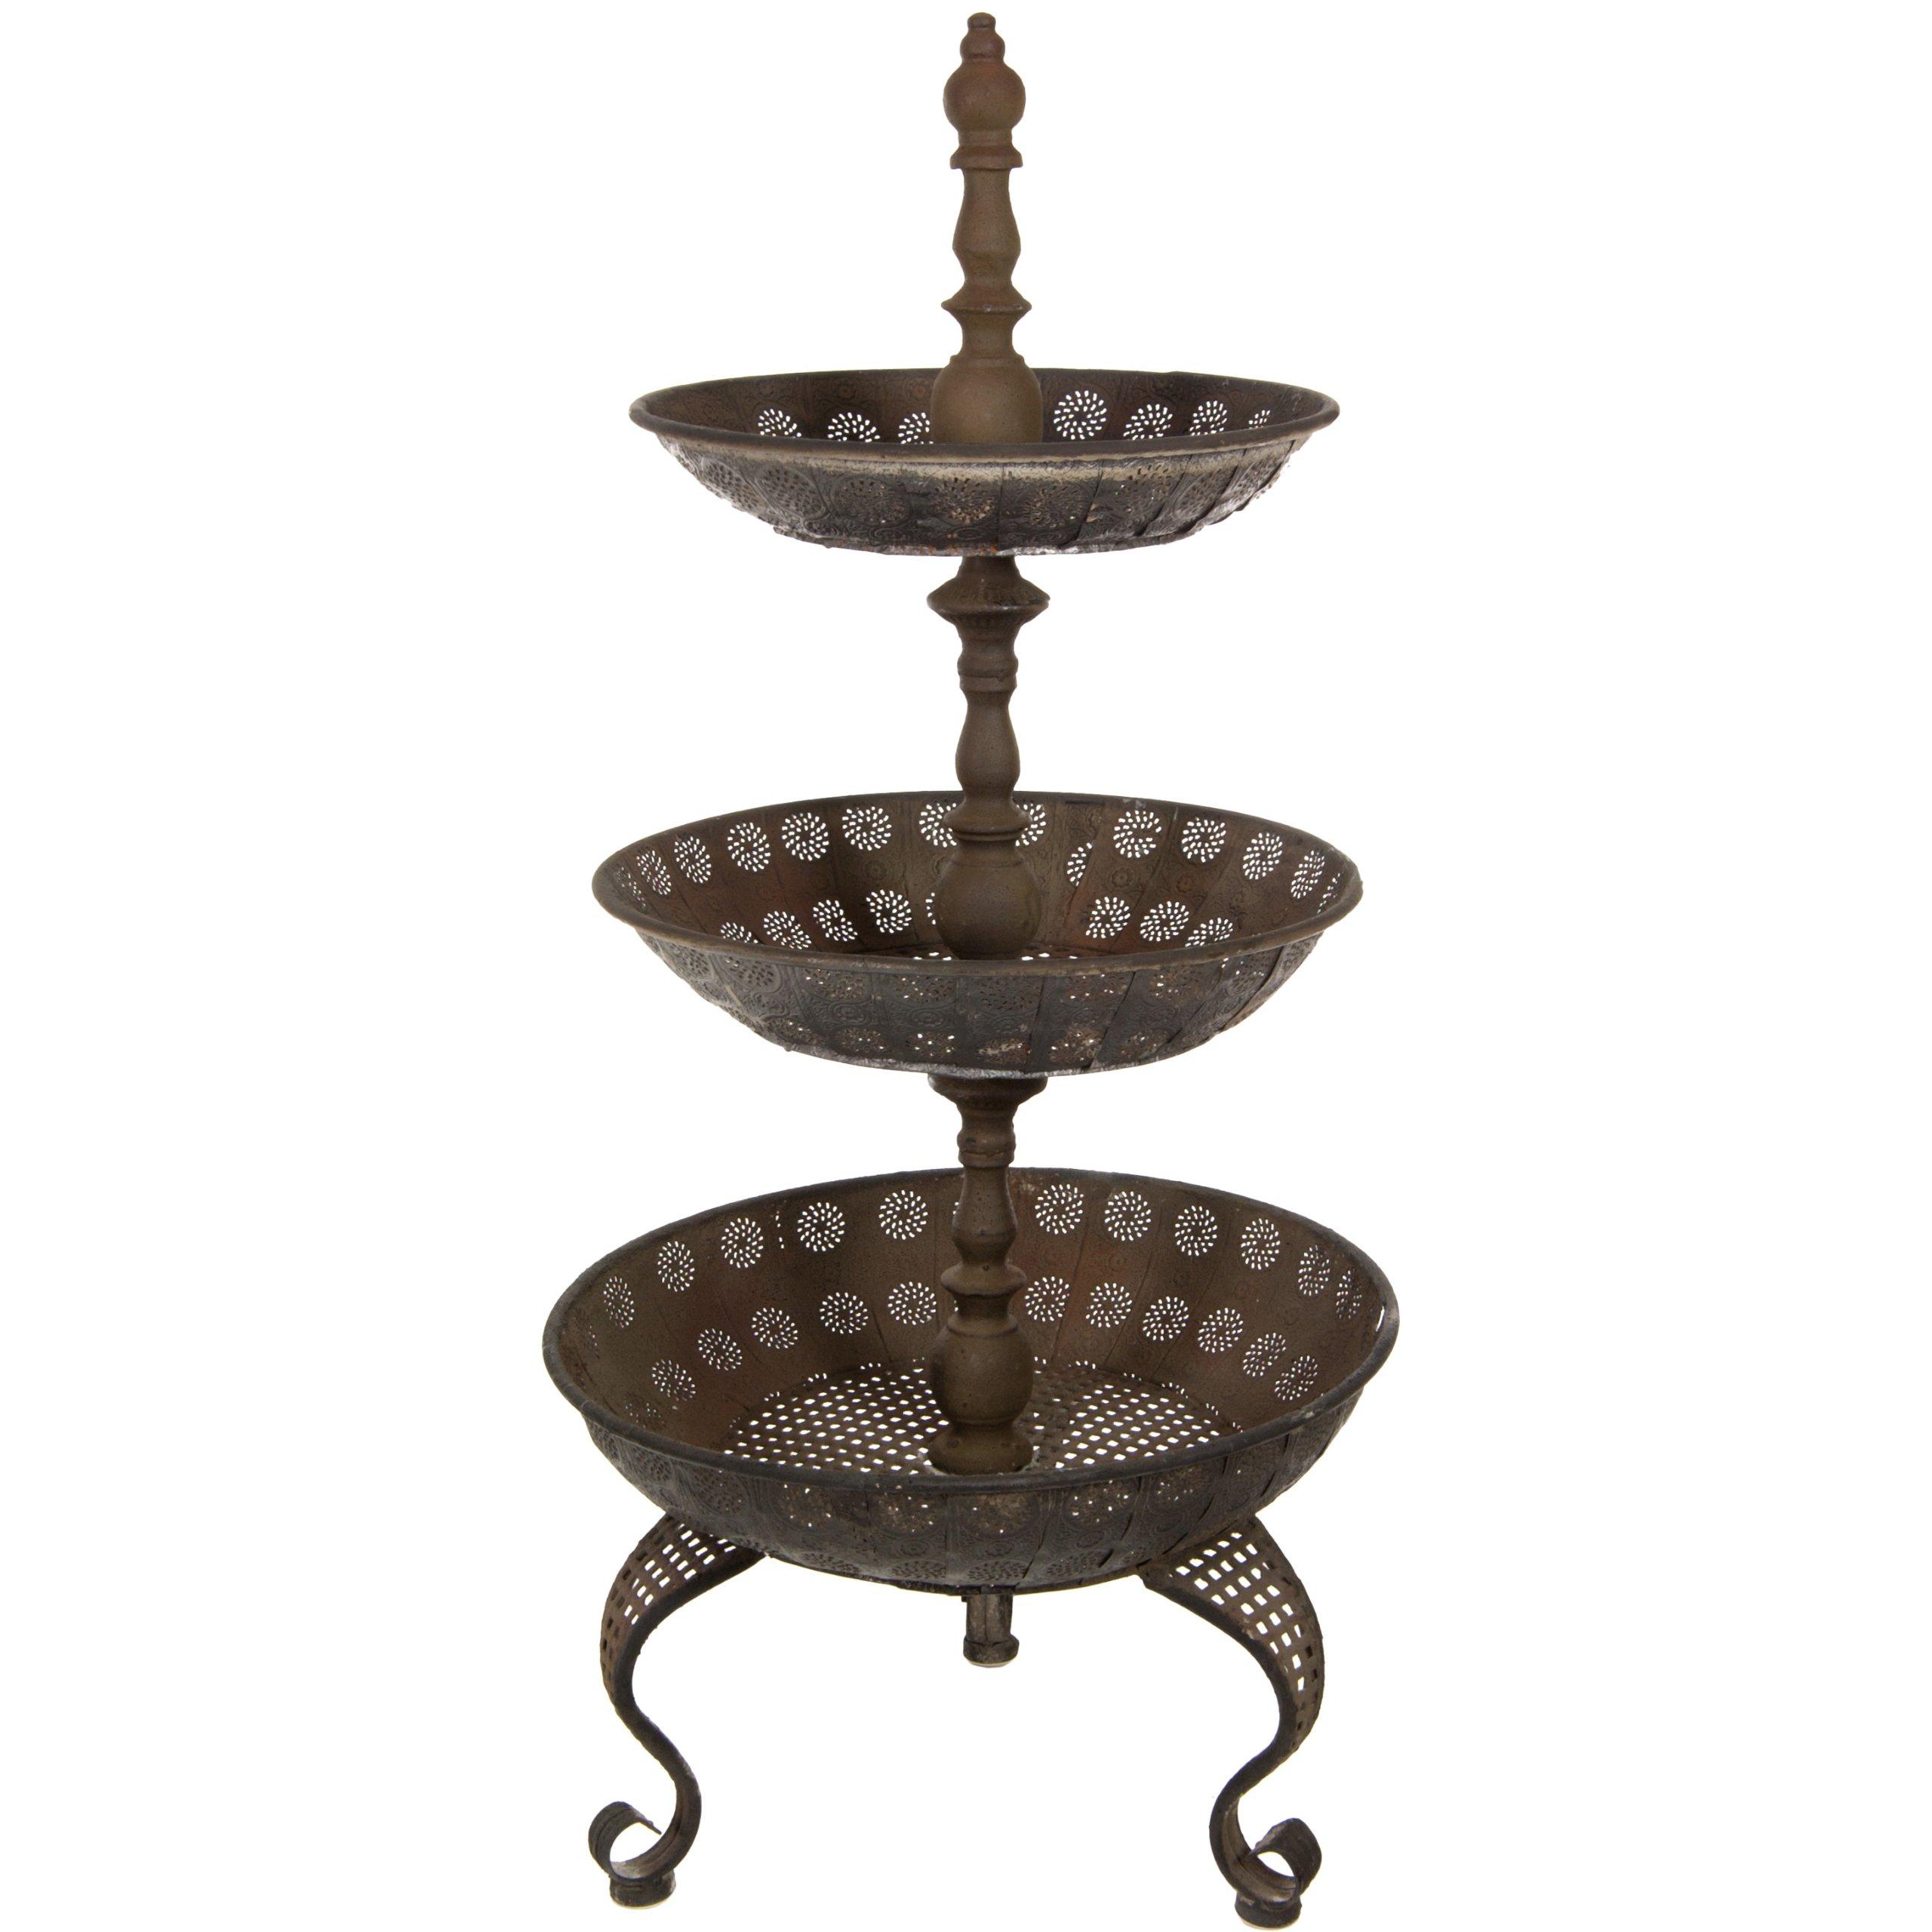 Oriental Furniture 3 Tier Iron Tray Display Stand